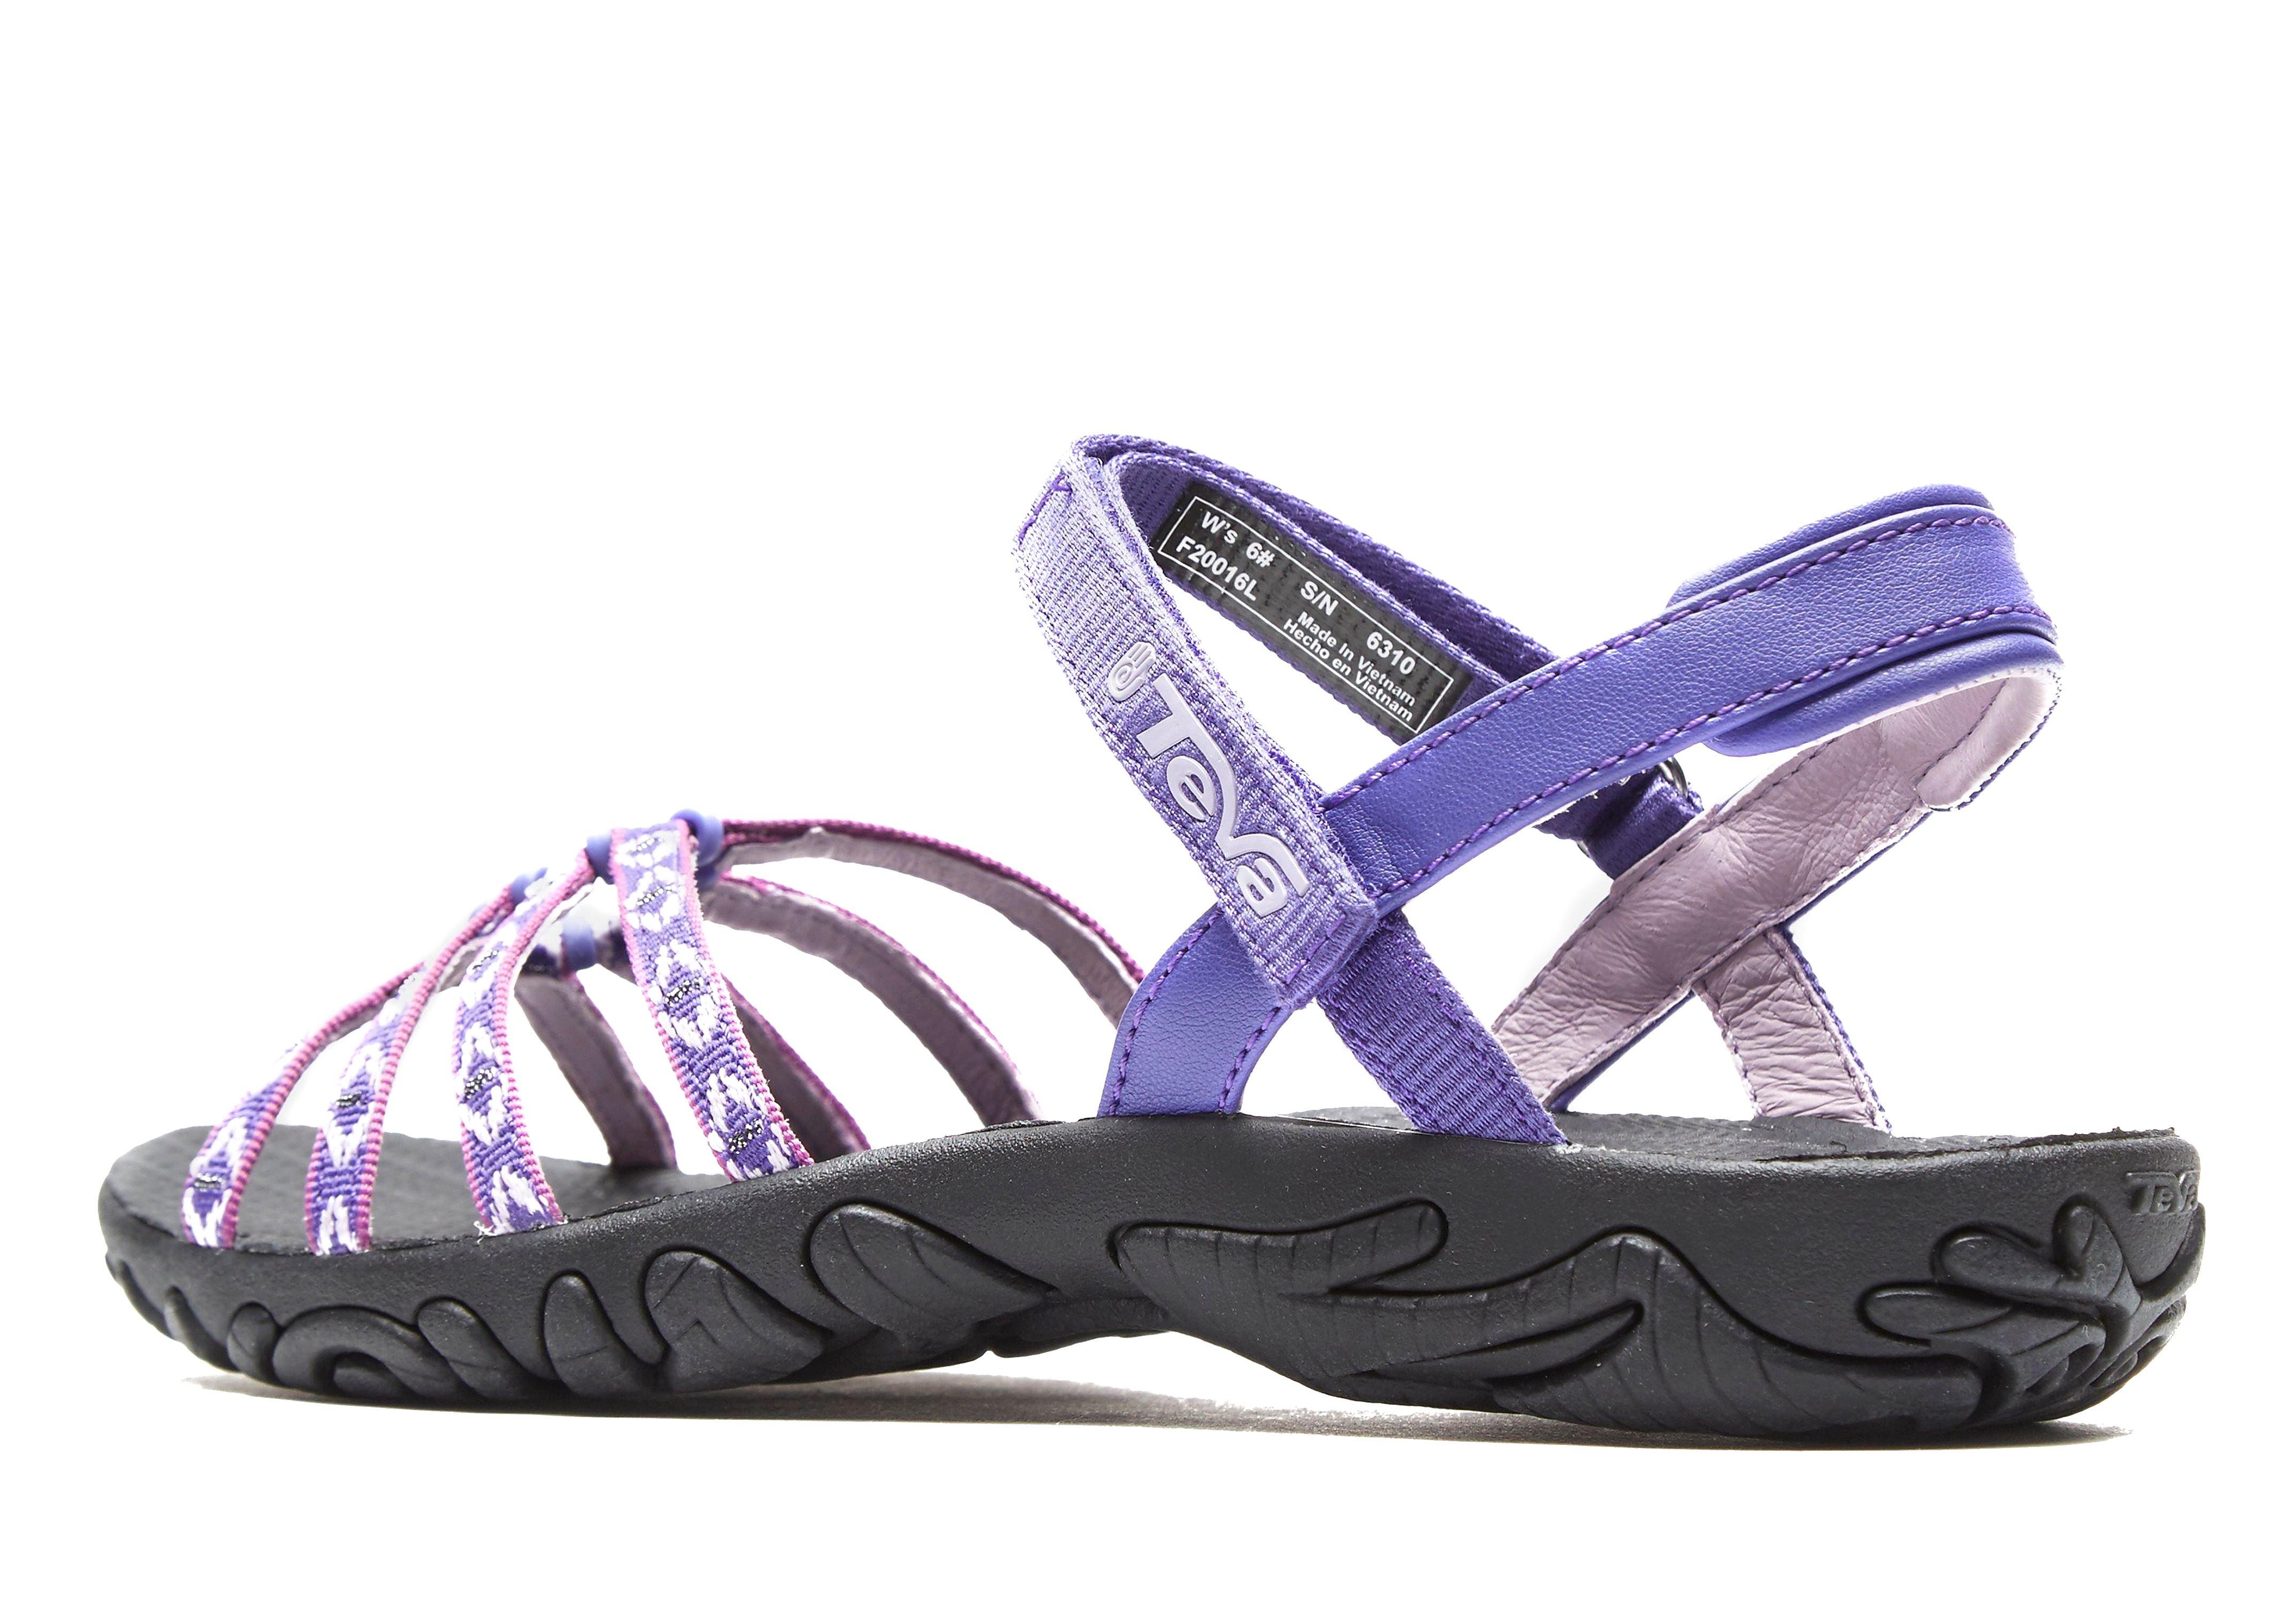 Teva Kayenta Woven Women's Sandals